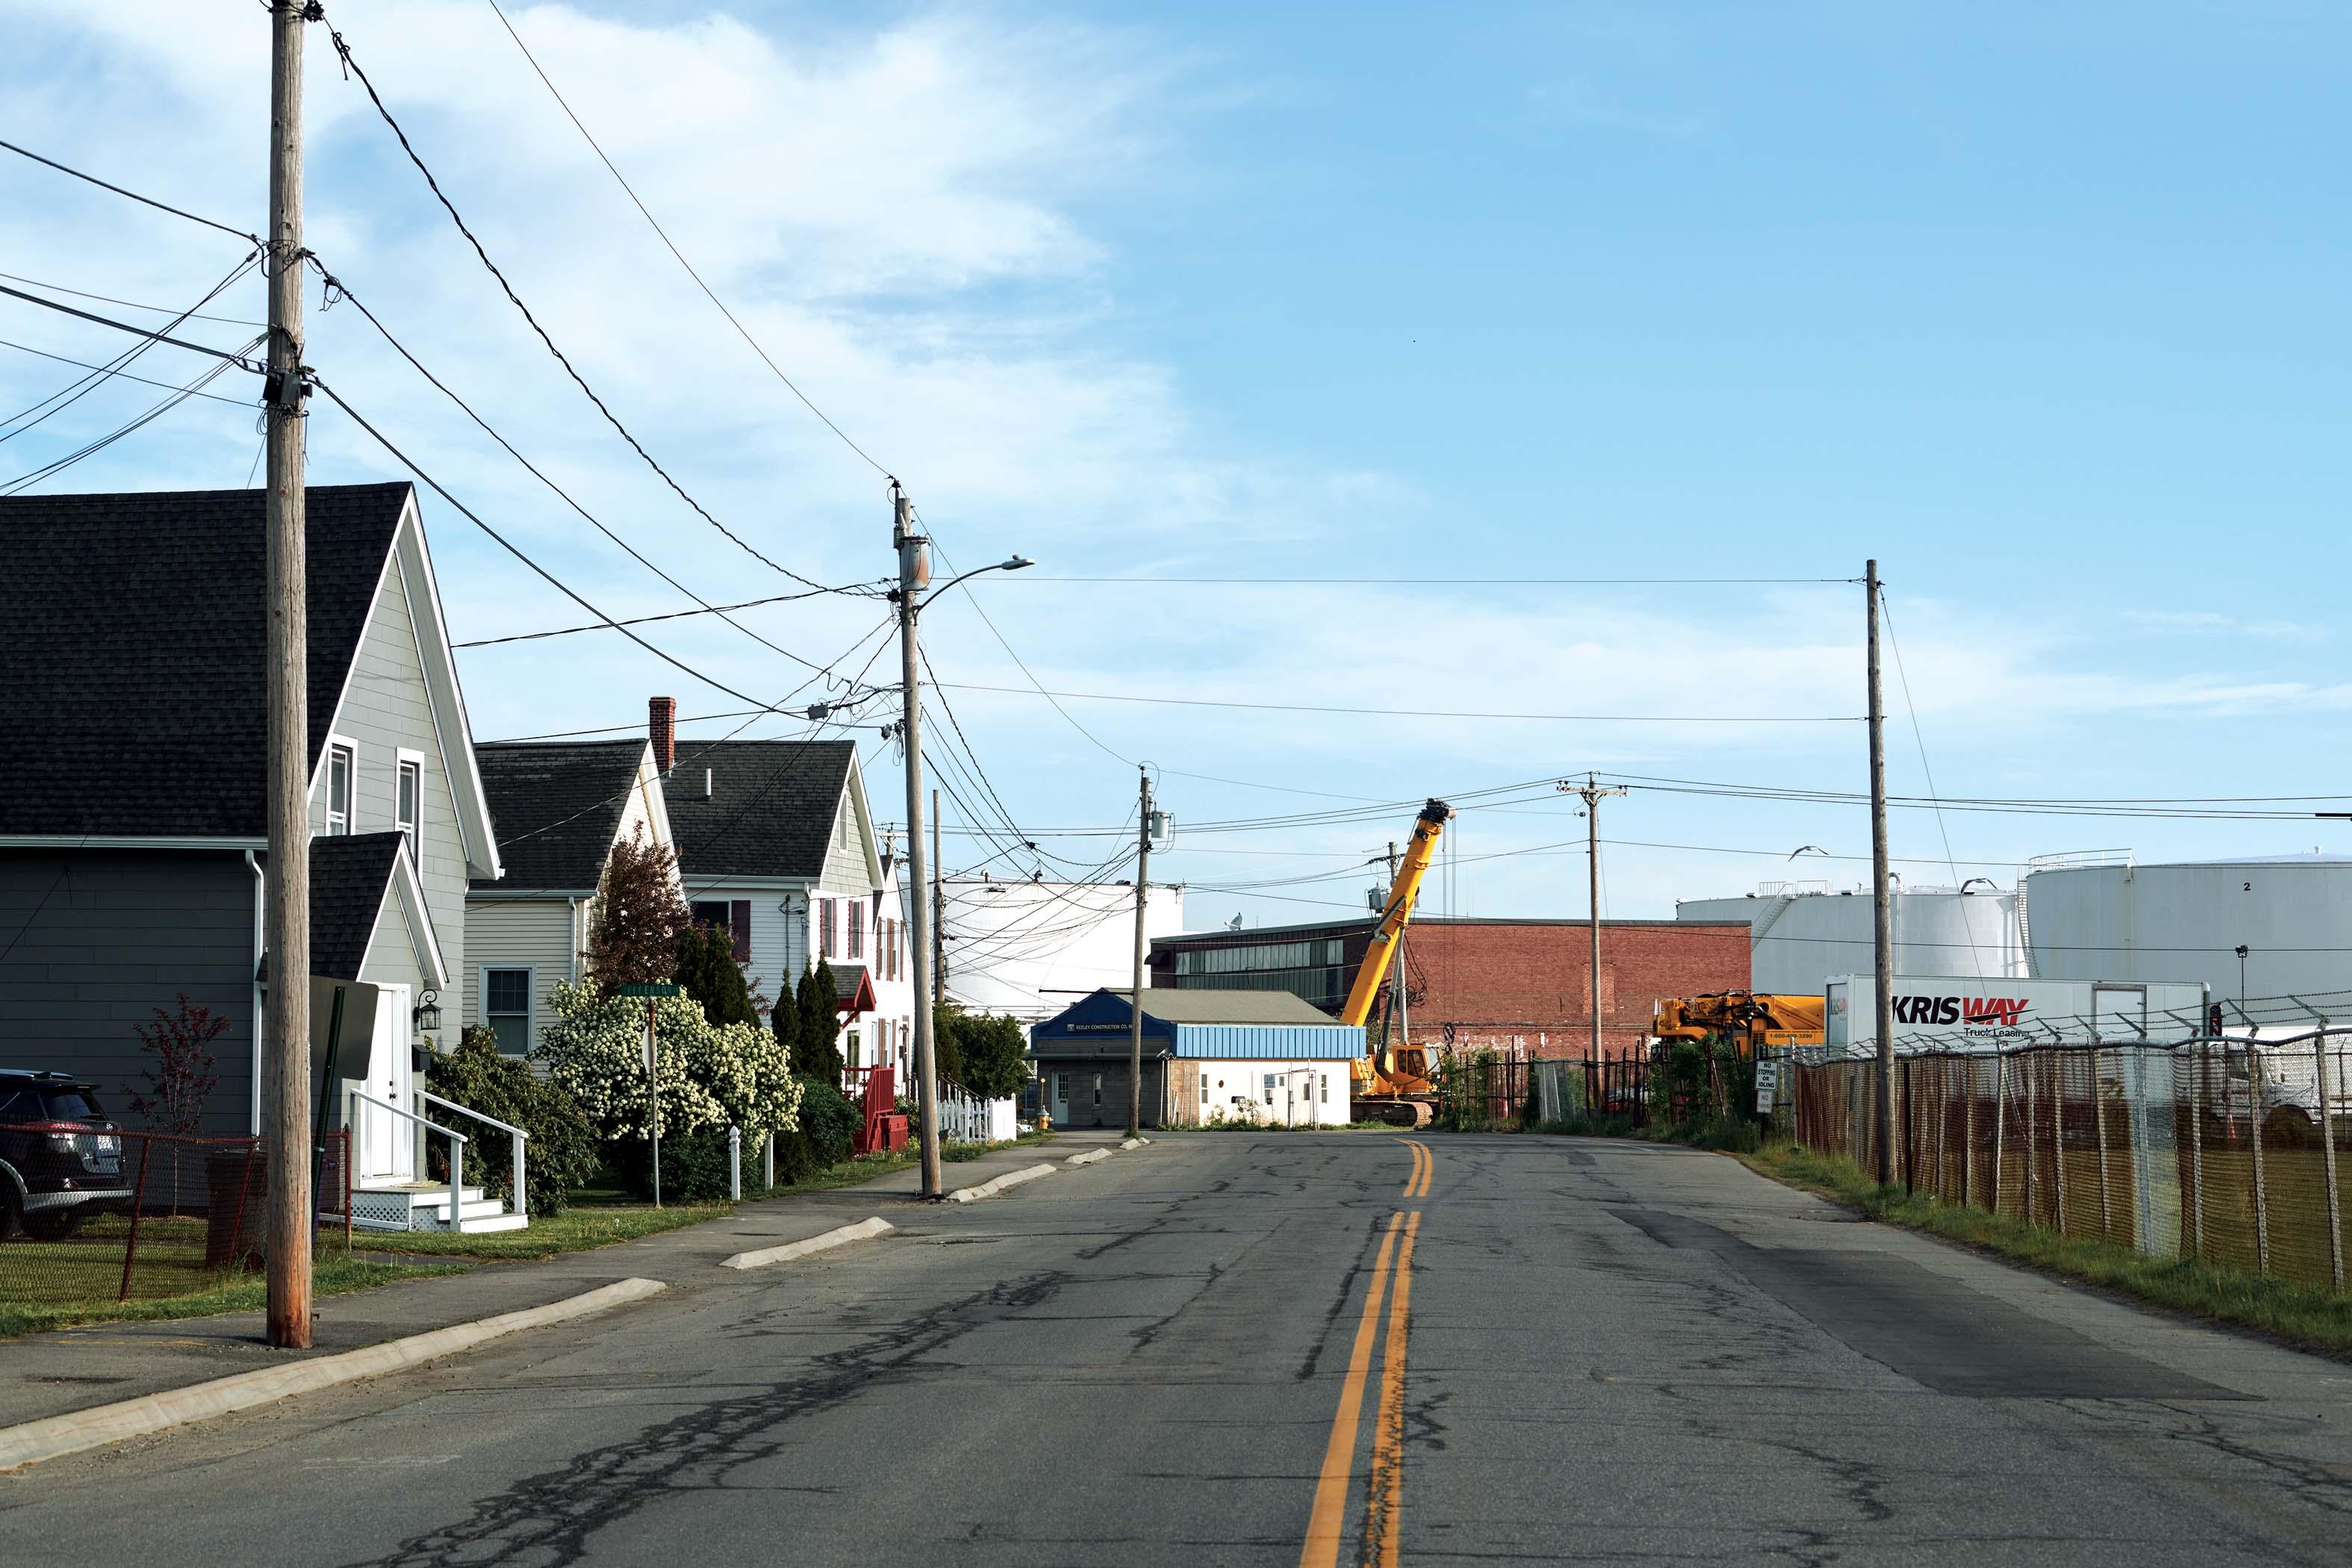 Petroleum storage tanks sit alongside a residential neighborhood in South Portland.